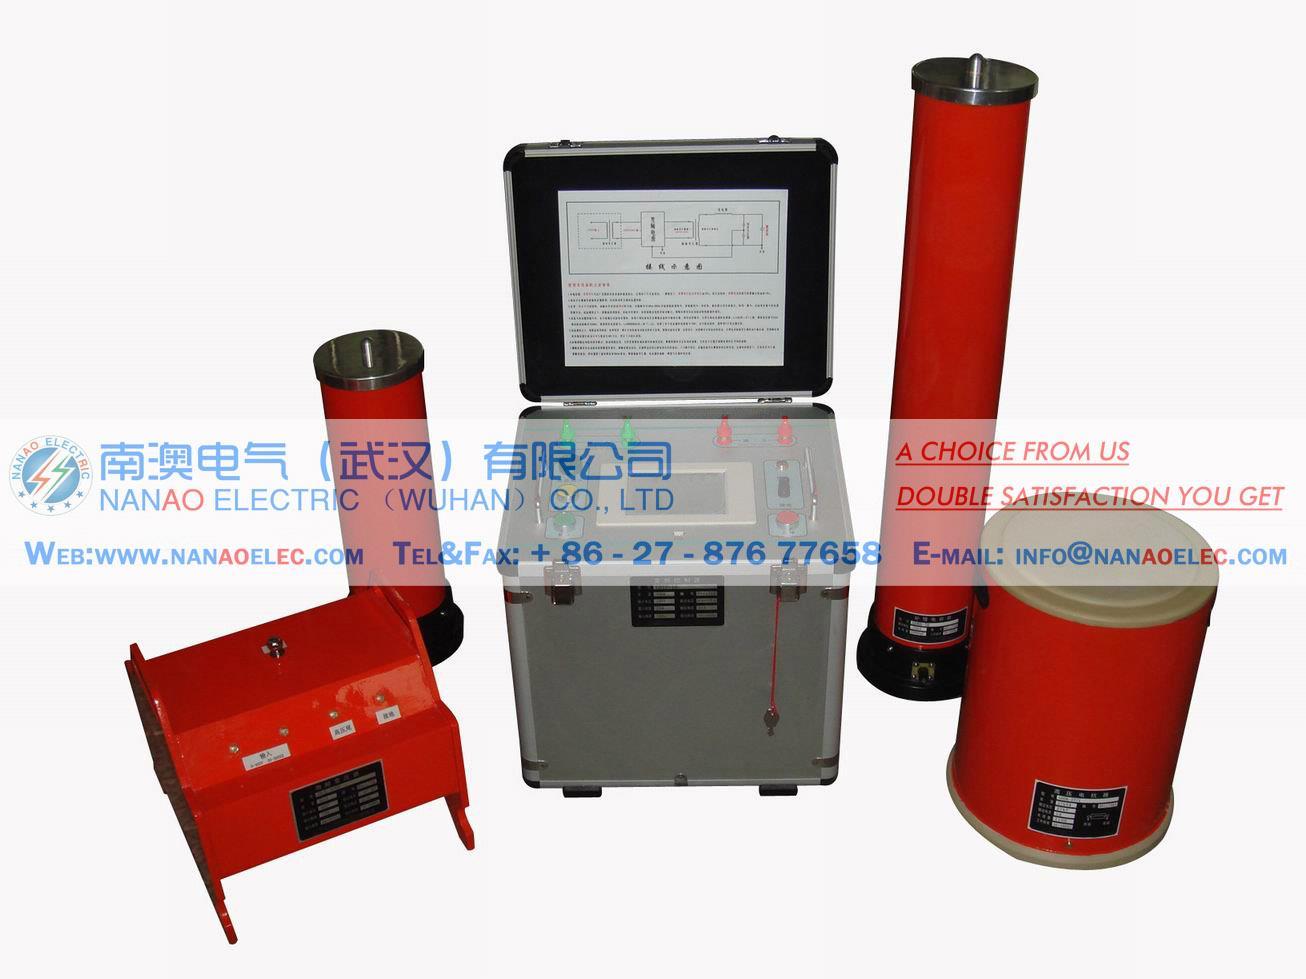 NAGXZ全自动工频谐振高压成套耐压试验装置